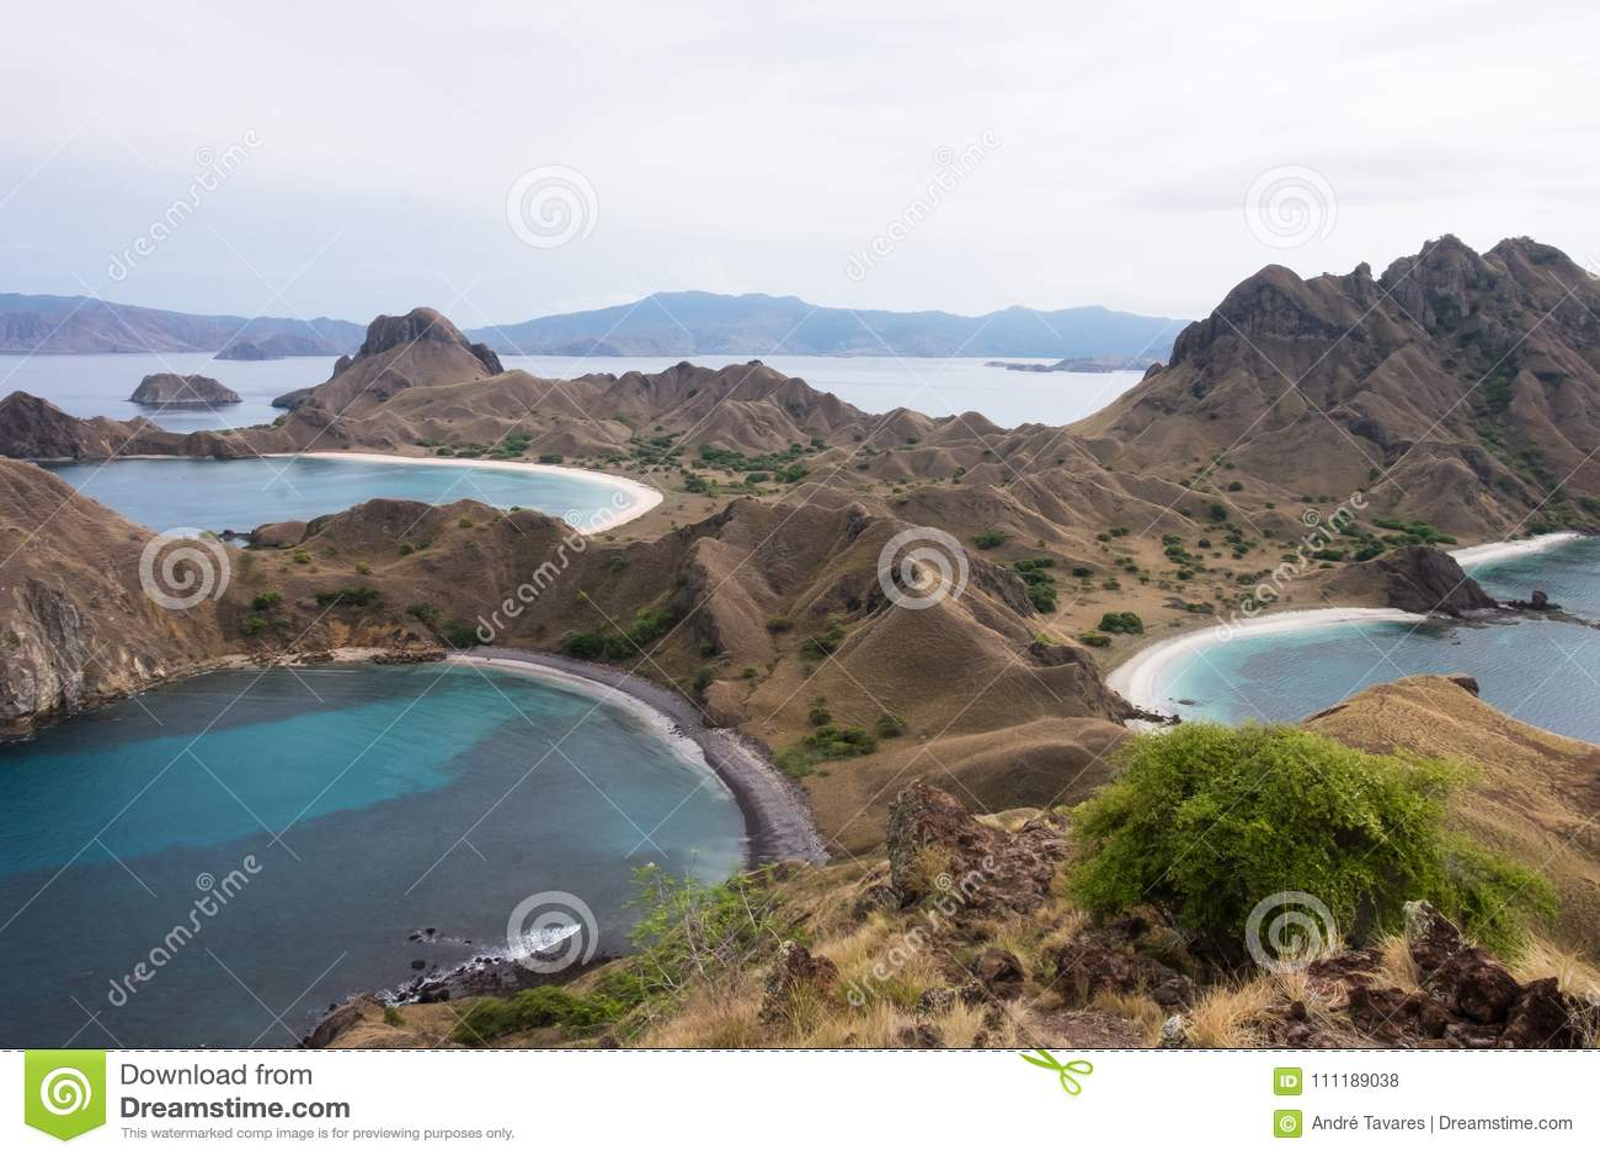 Padar Island in Labuan Bajo, Flores Indonesia